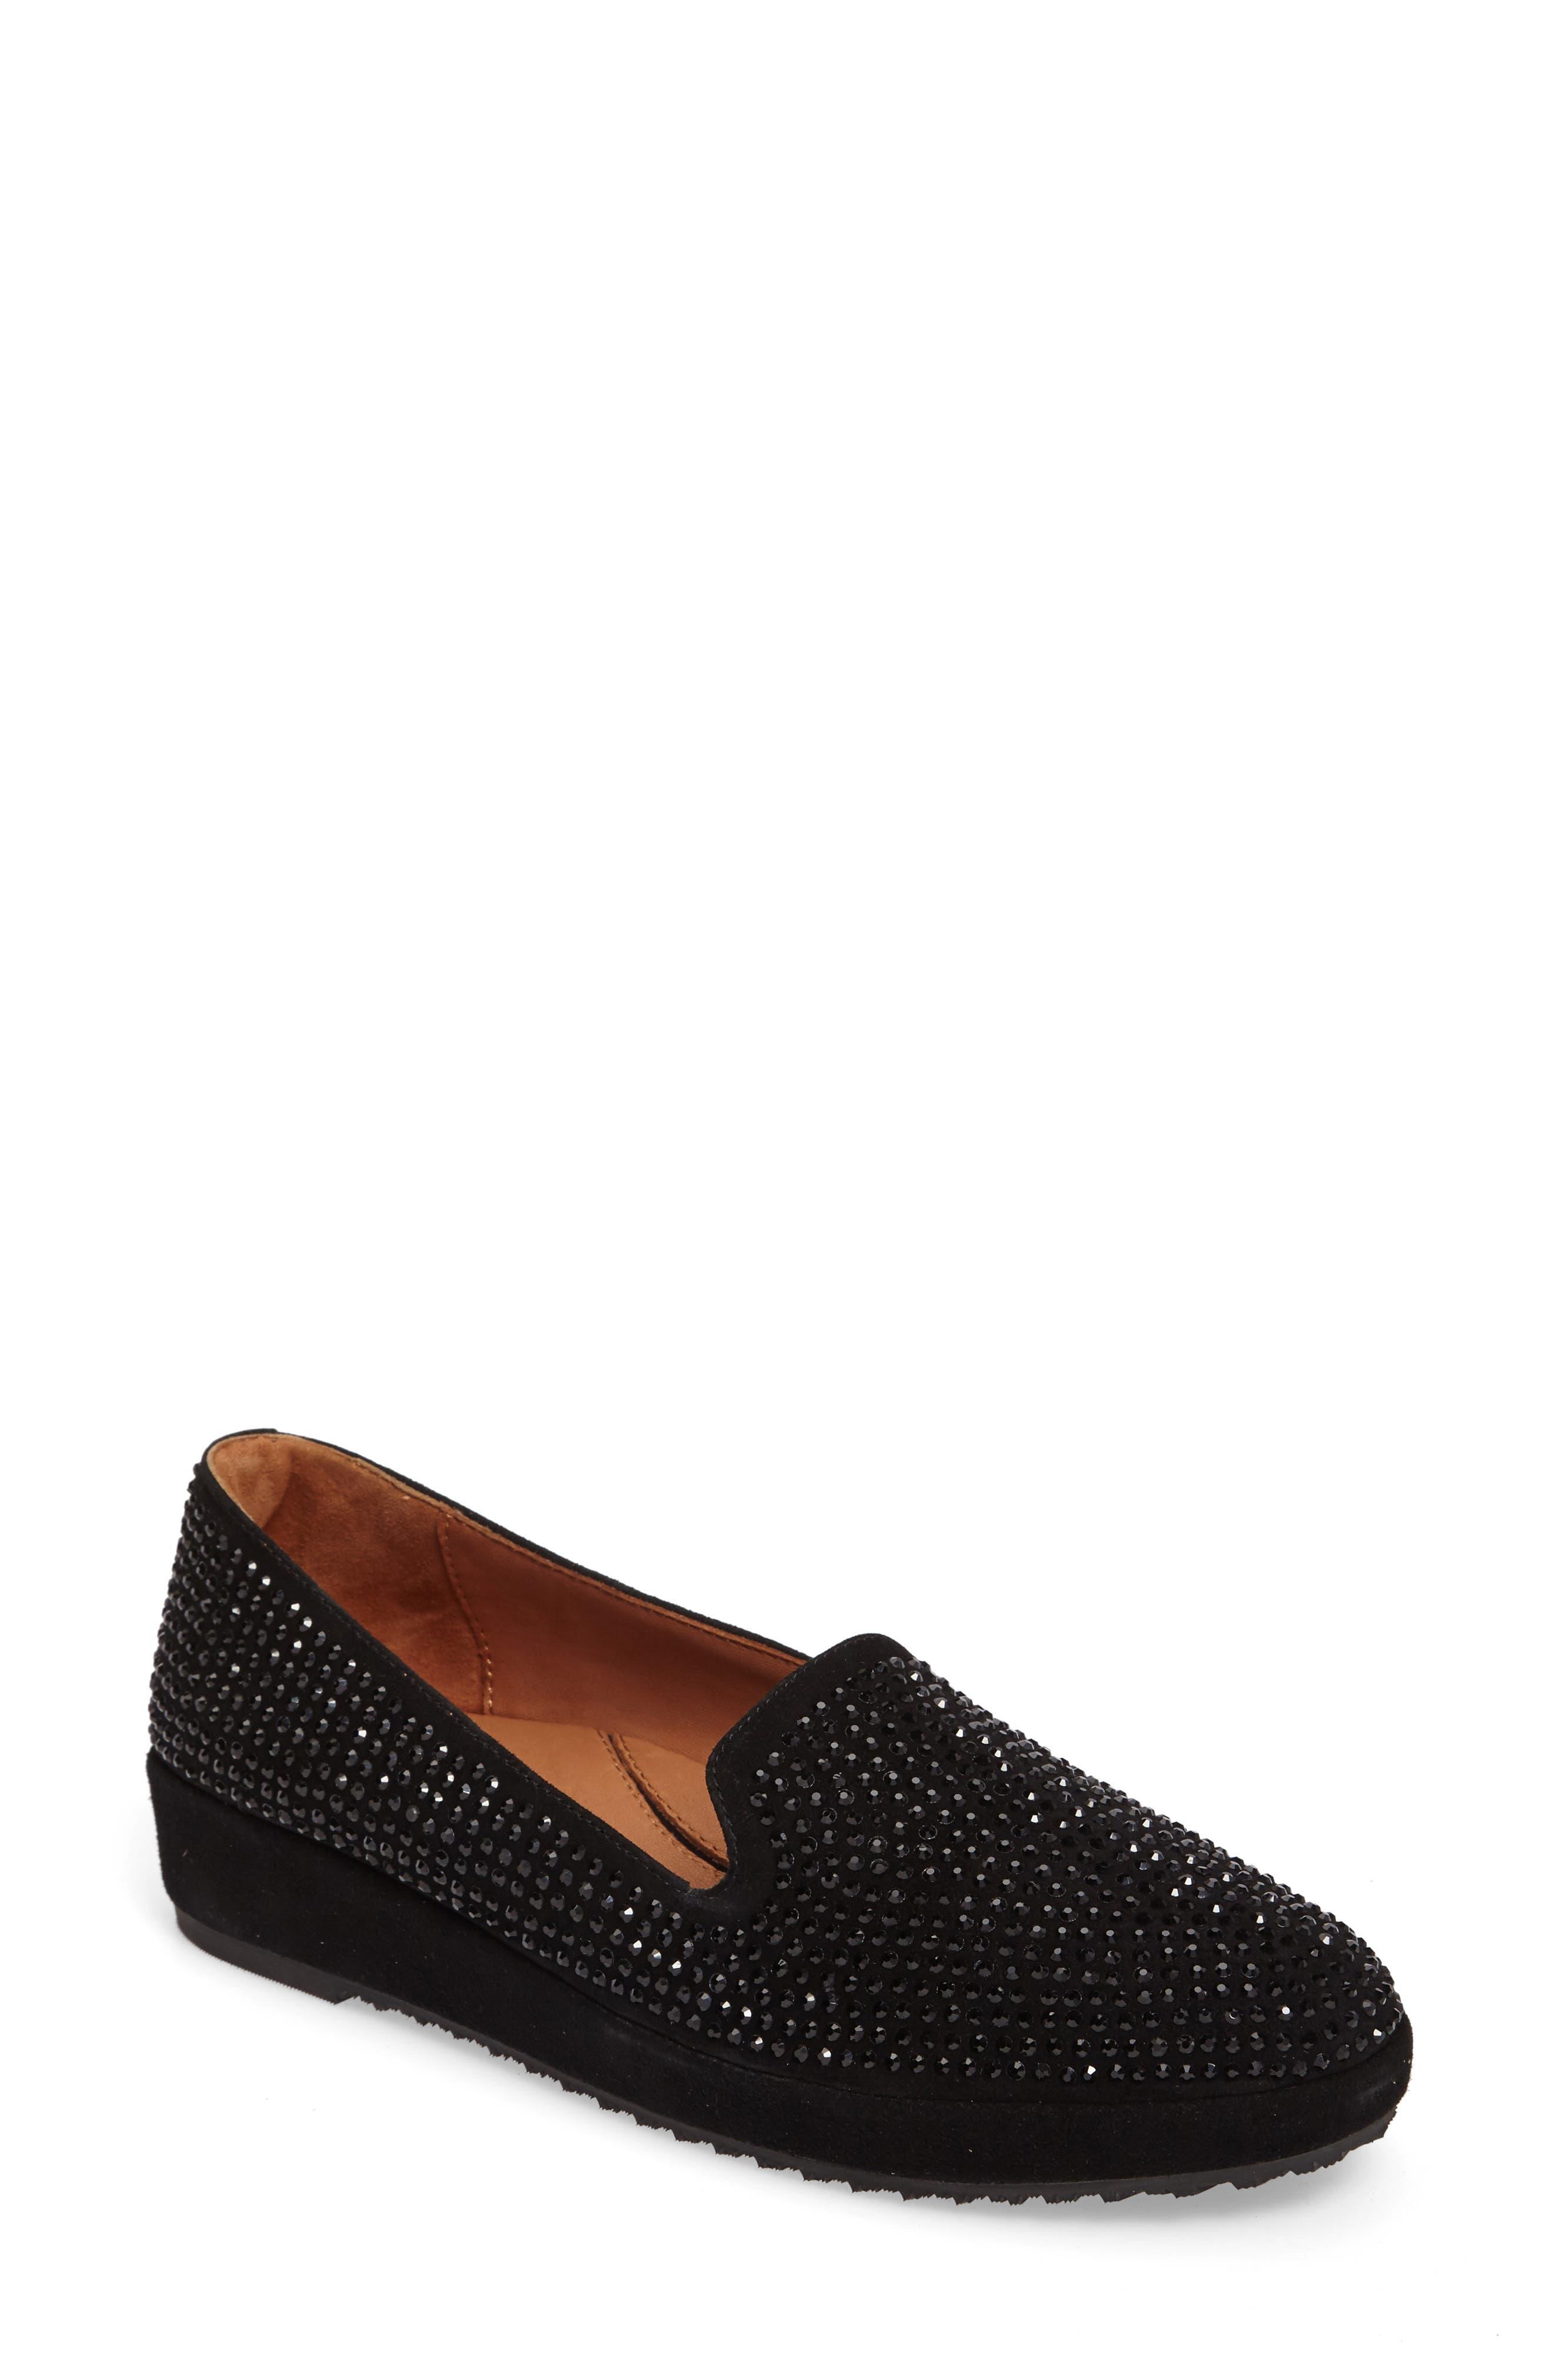 Correze Wedge Slip-On,                         Main,                         color, BLACK SUEDE